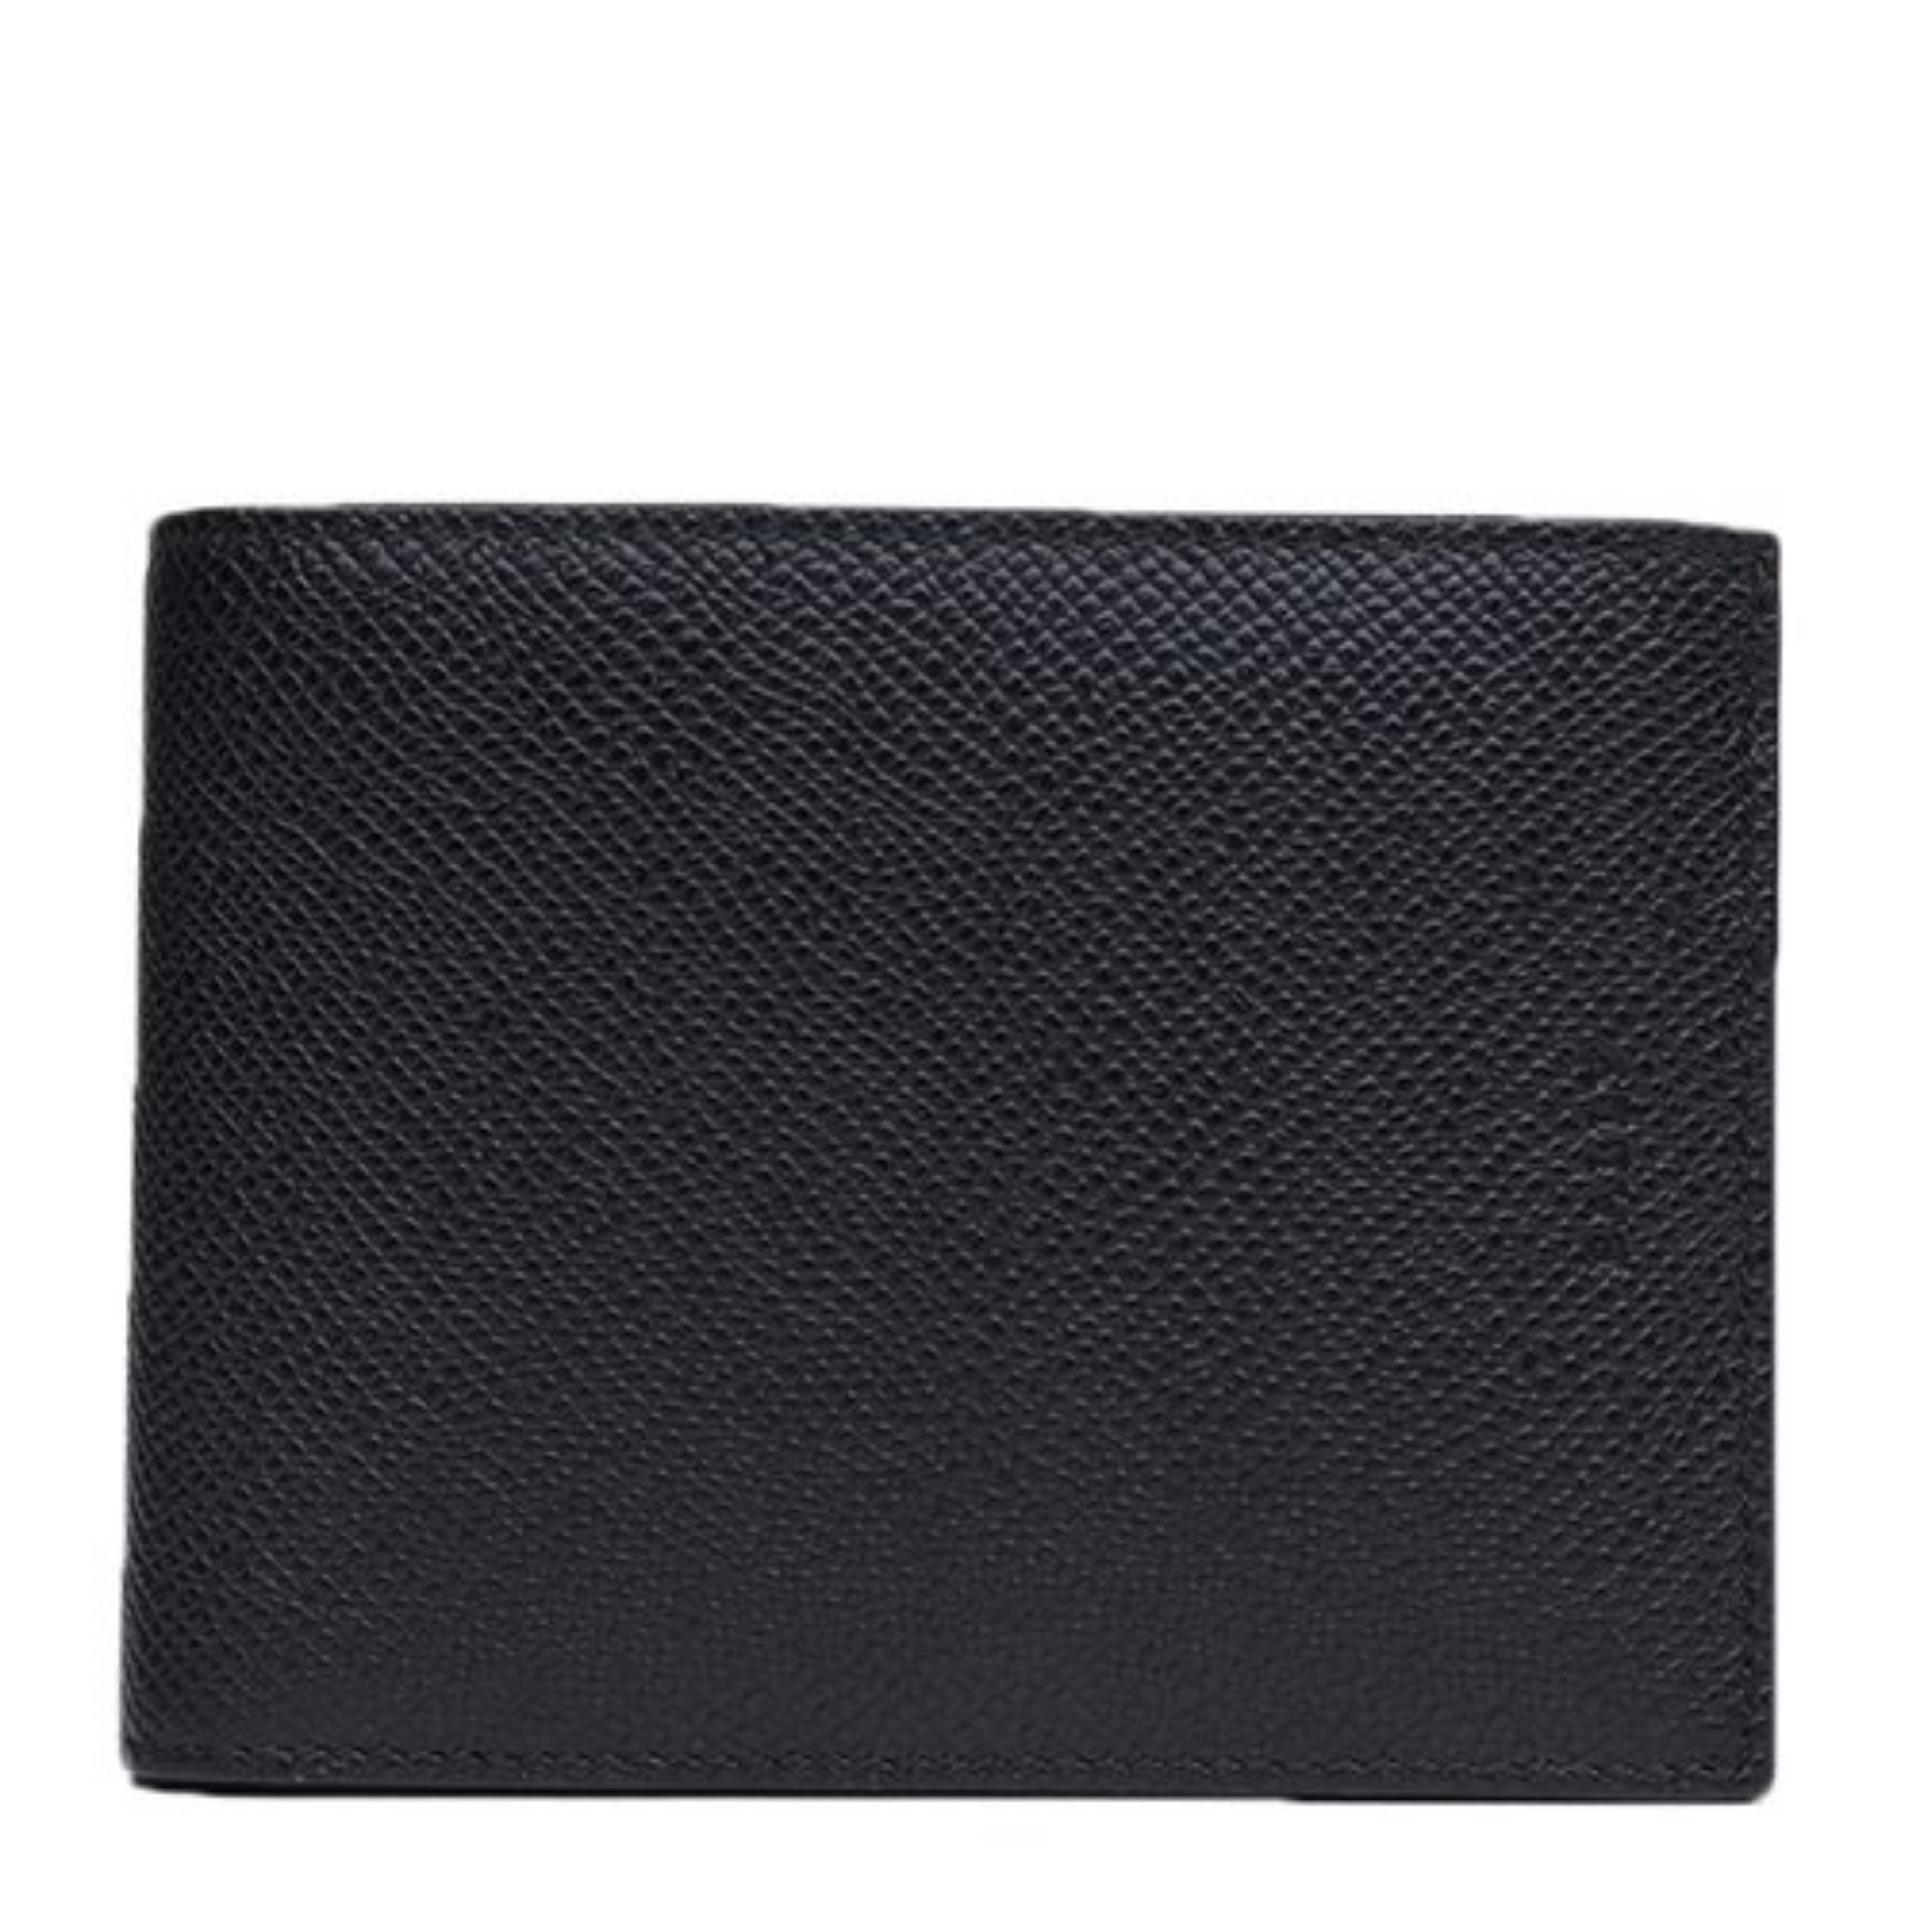 Bally Baliky Bifold Wallet (Black) # 6214523216BALIKY